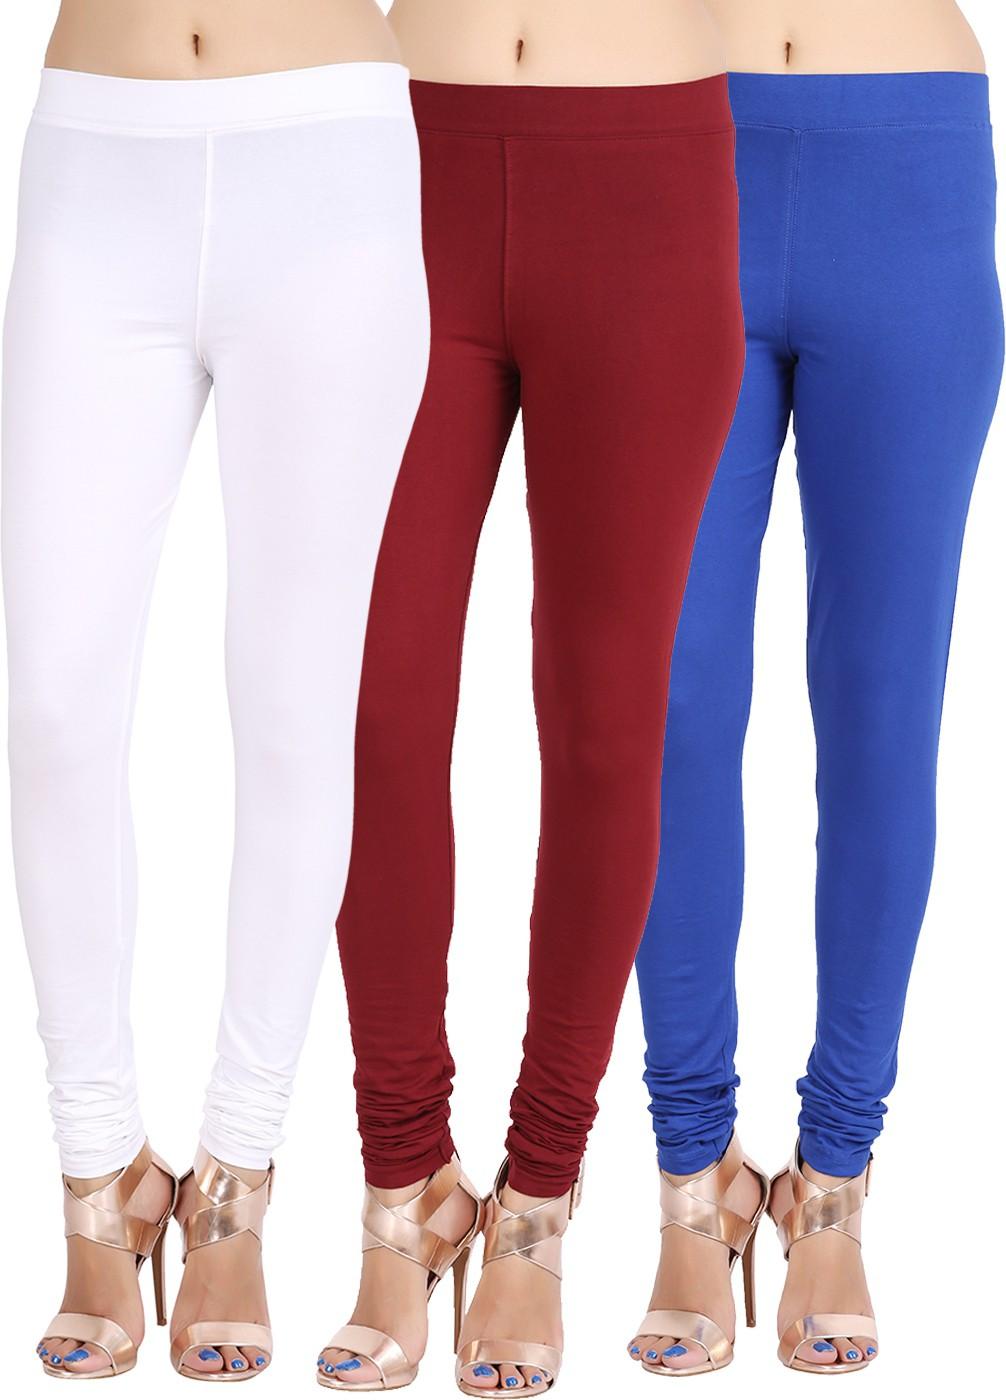 Lula Ms Womens White, Dark Blue, Brown Leggings(Pack of 3)